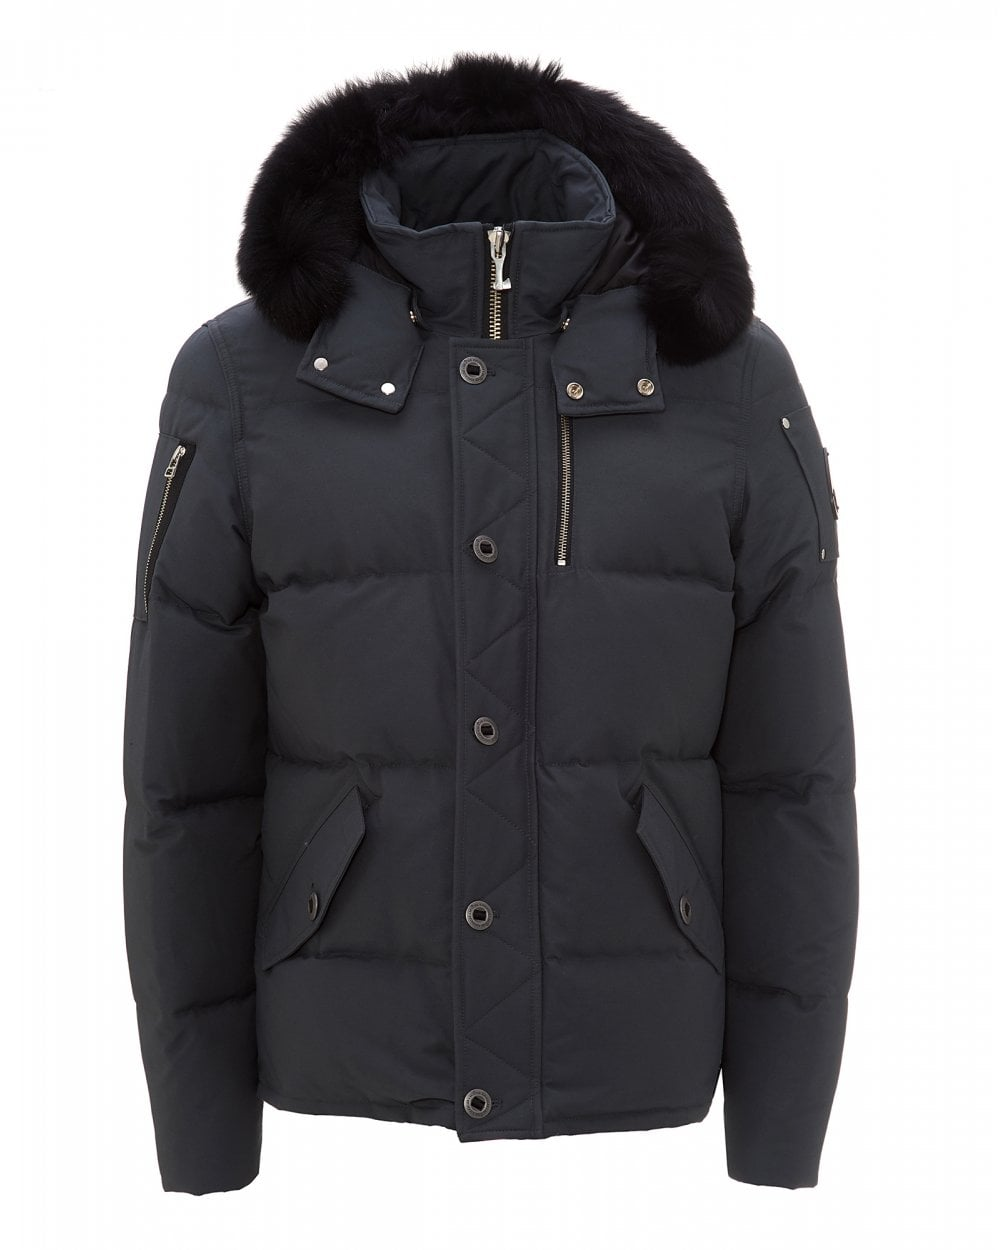 Moose Knuckles Black 3Q Fur Hood Jacket | eBay